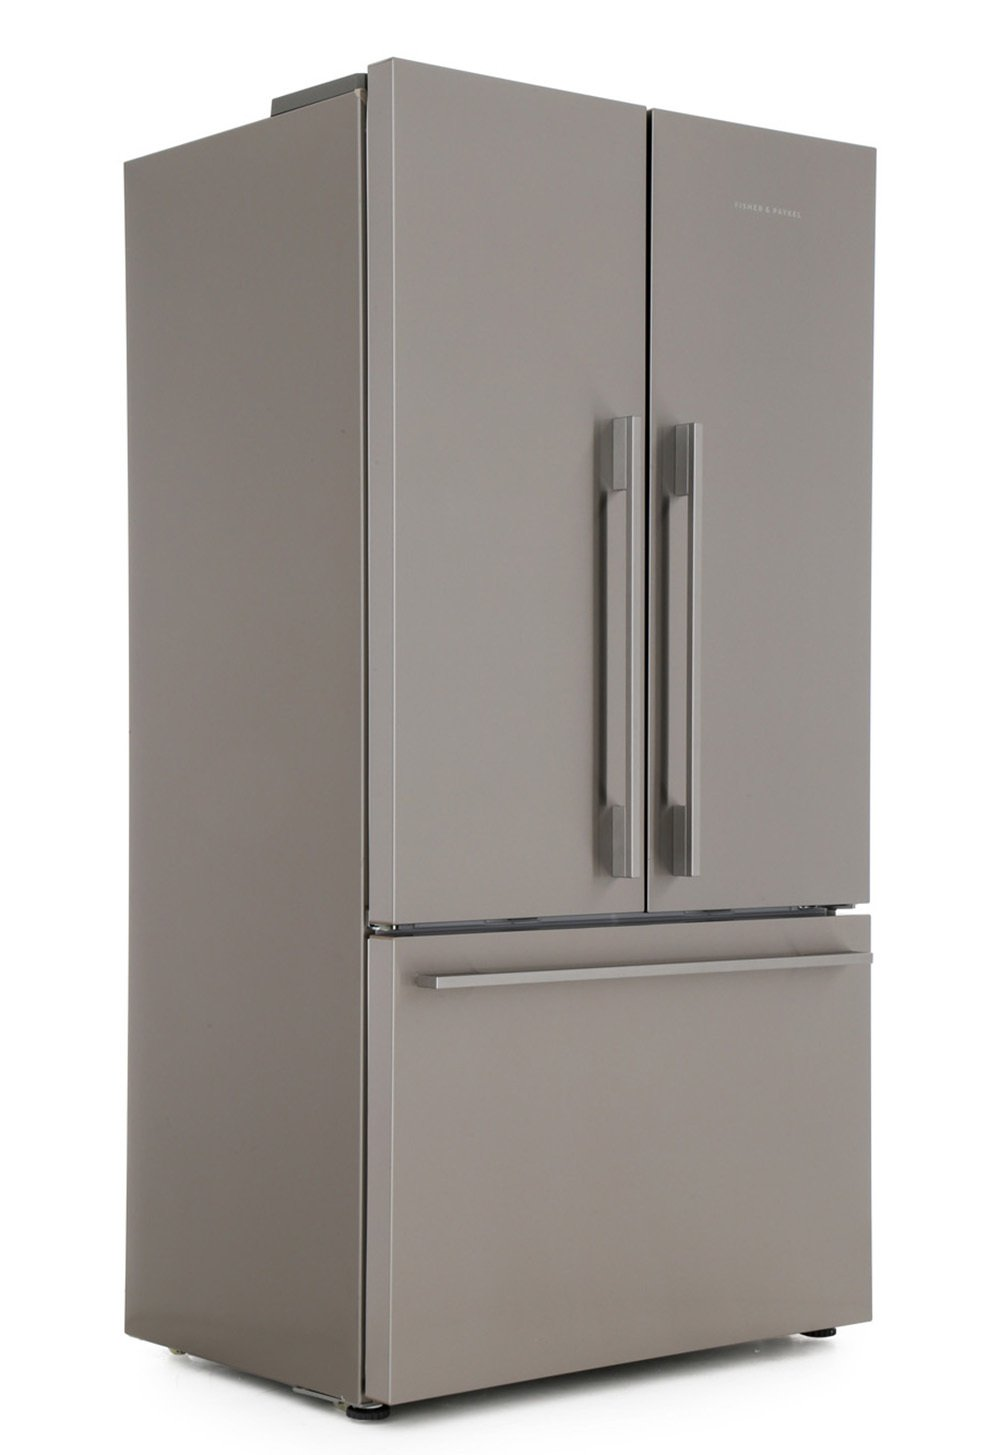 Fisher & Paykel RF610ADX4 Designer American Fridge Freezer